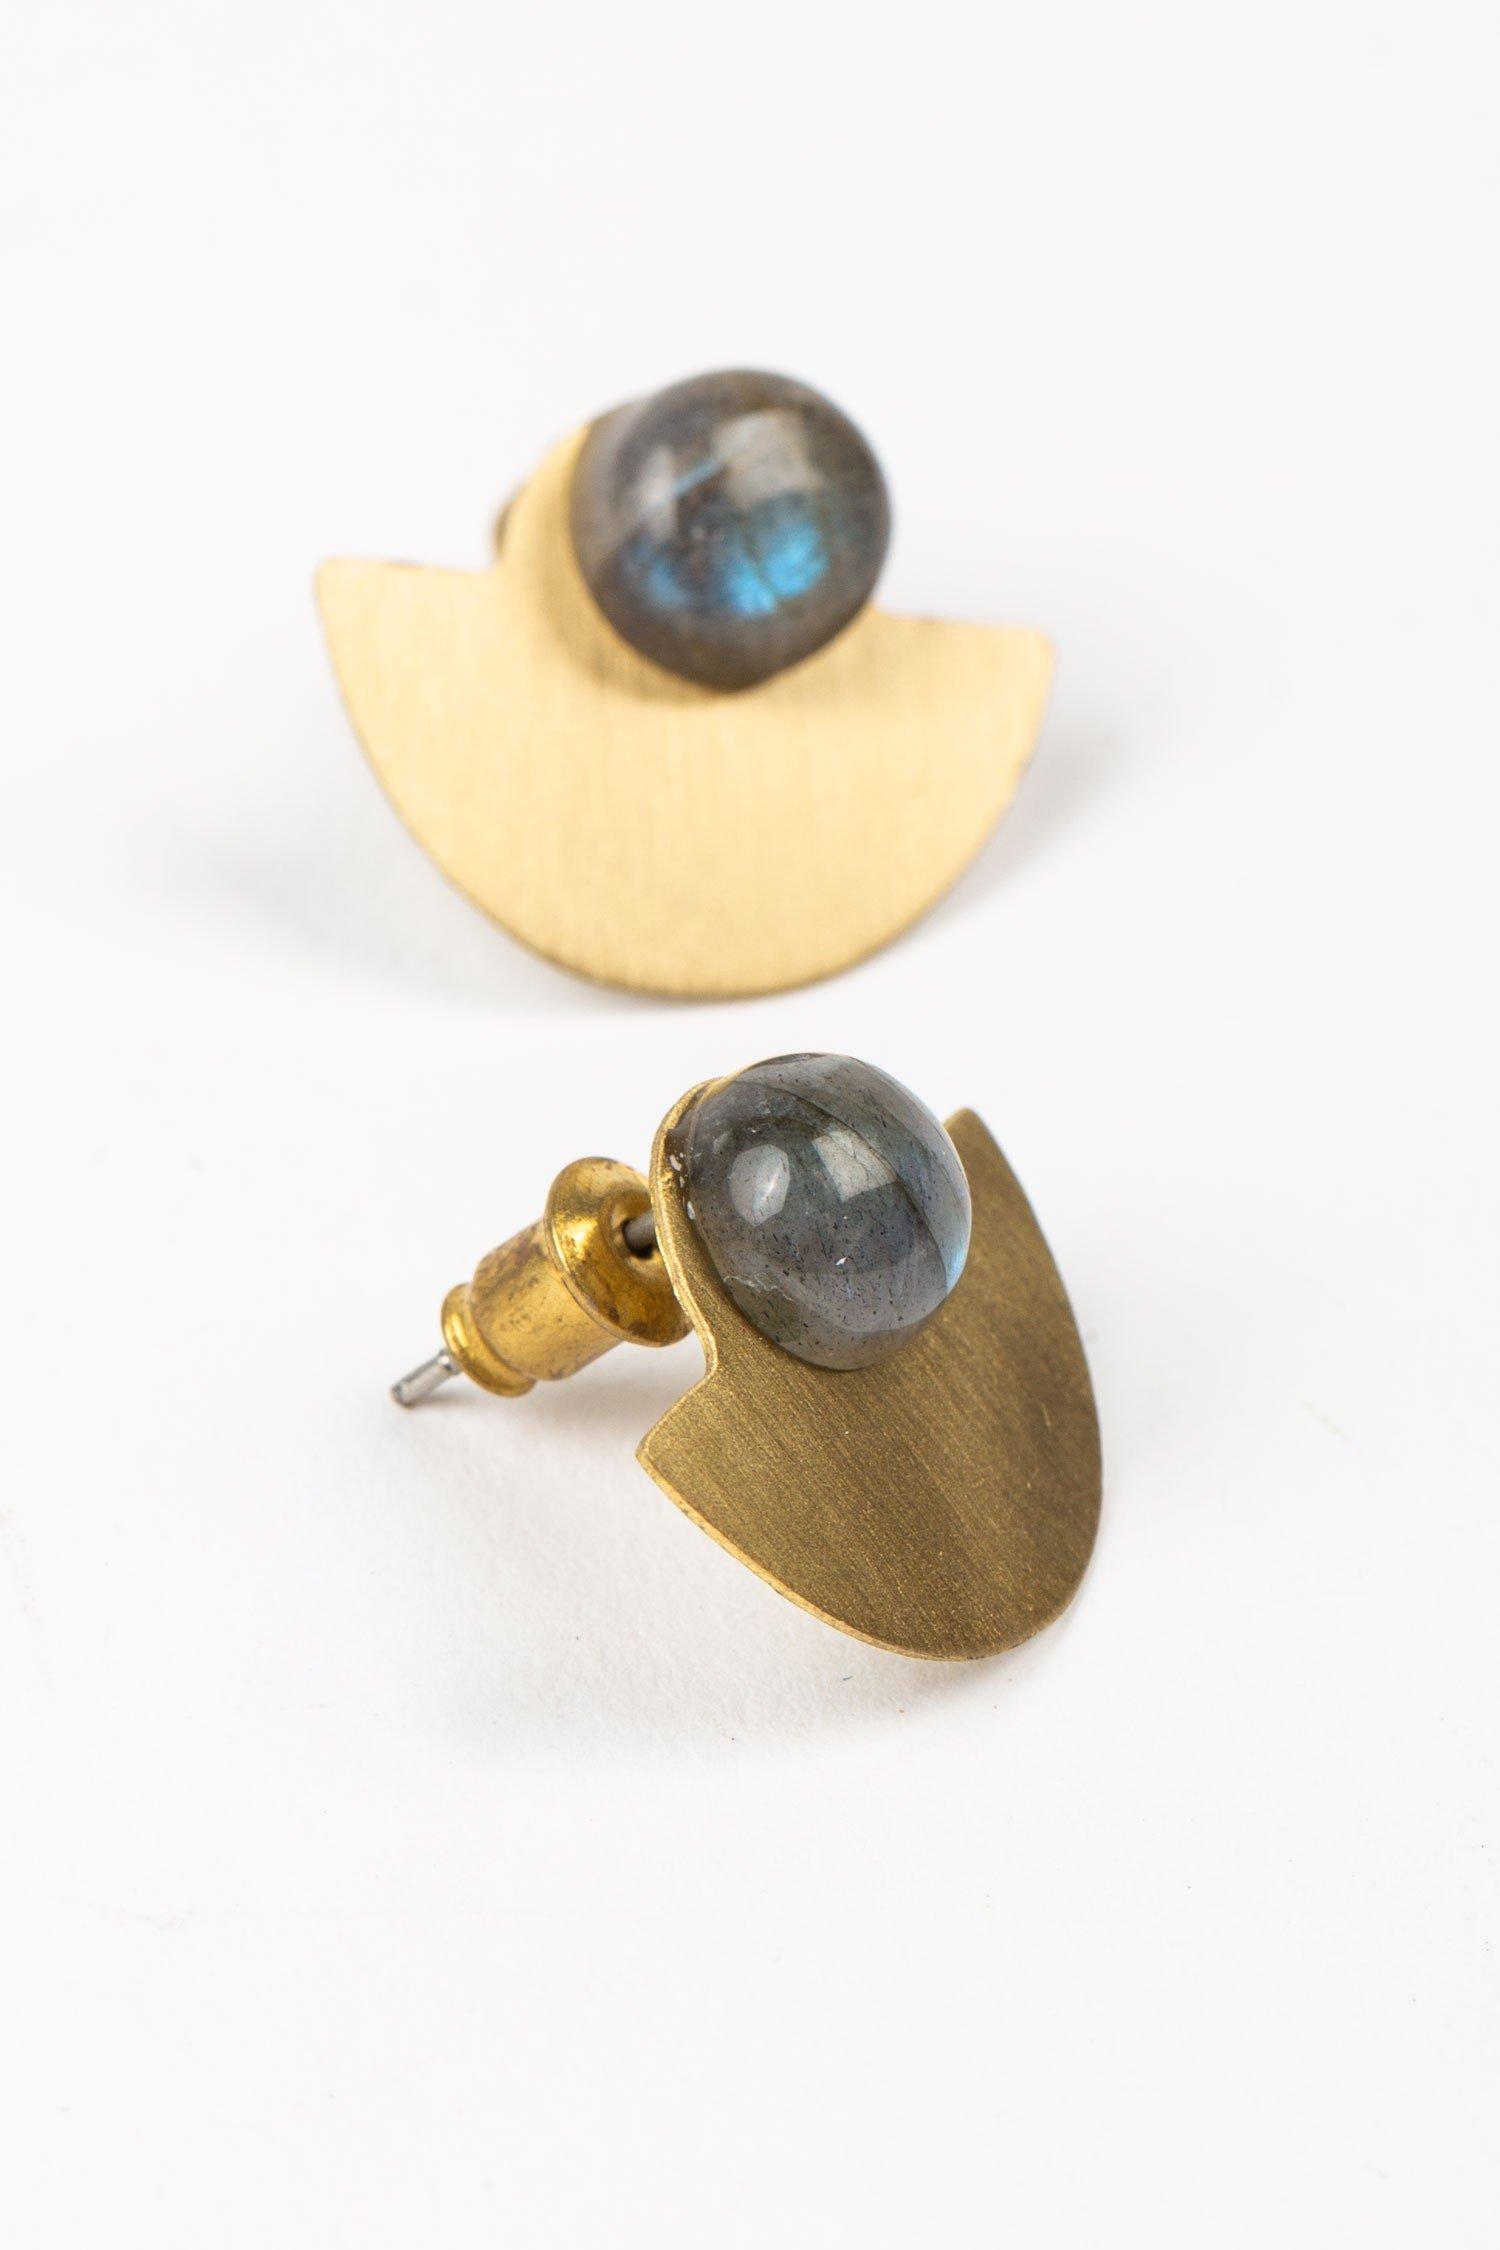 Ethical Earrings | Labradorite Moon Earrings